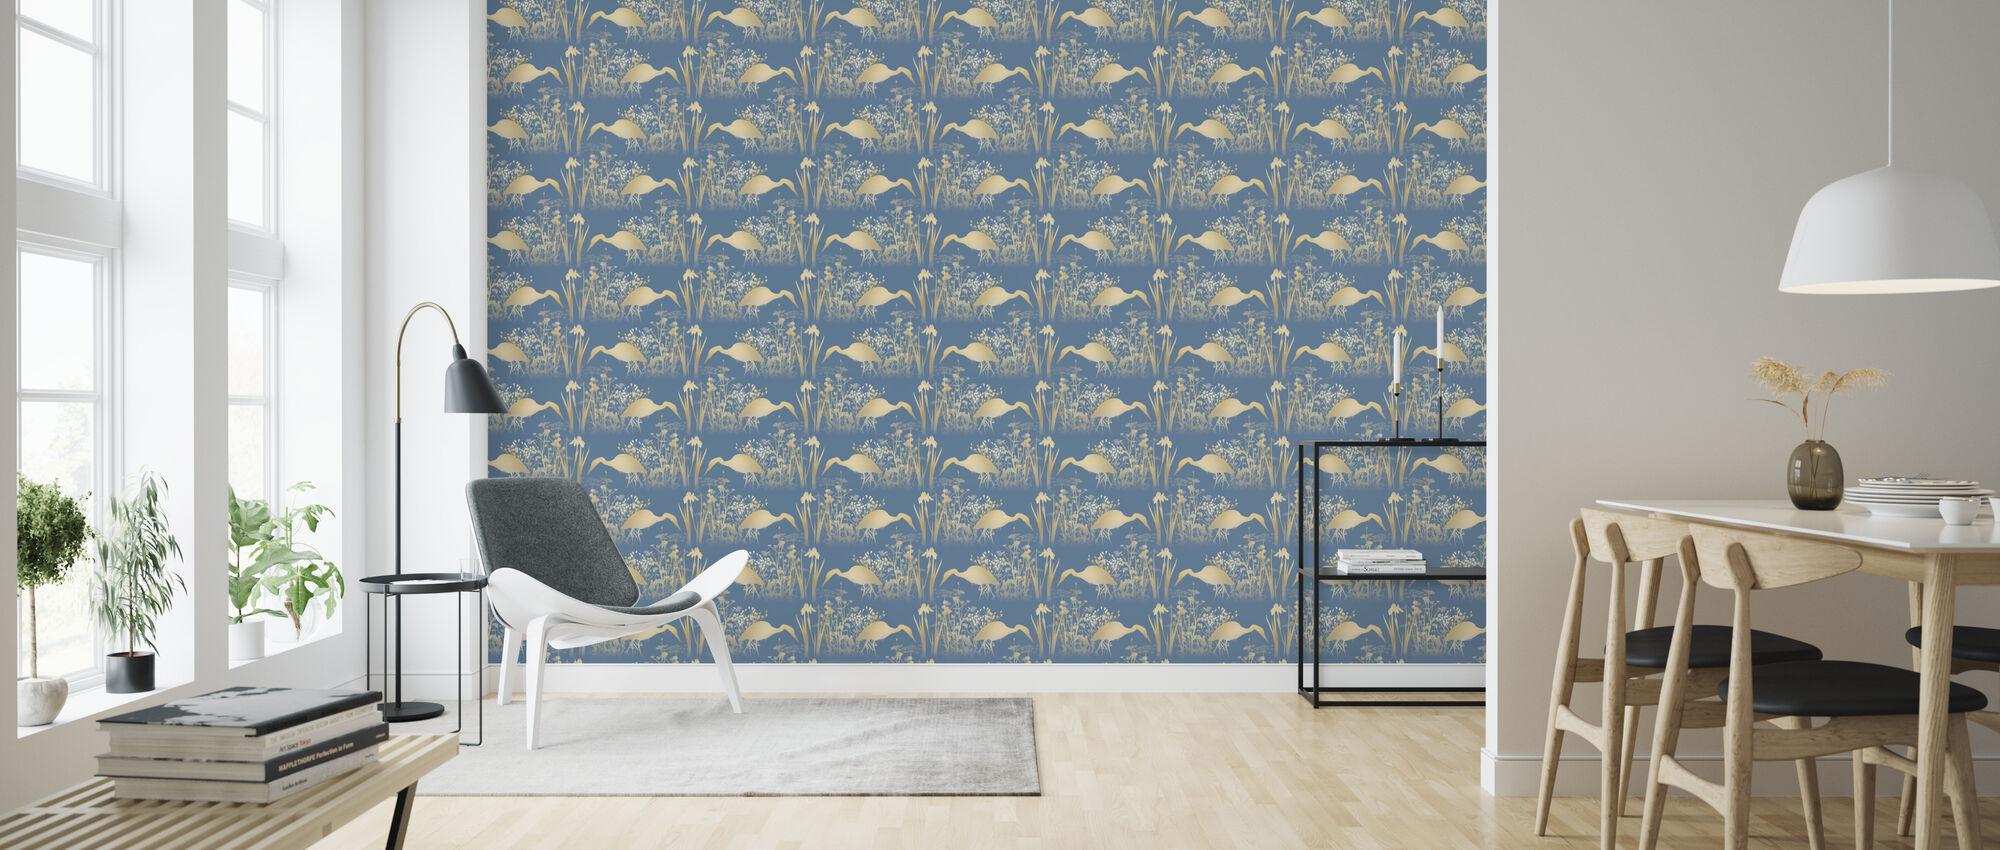 Fishing Heron Goldenlight - Wallpaper - Living Room